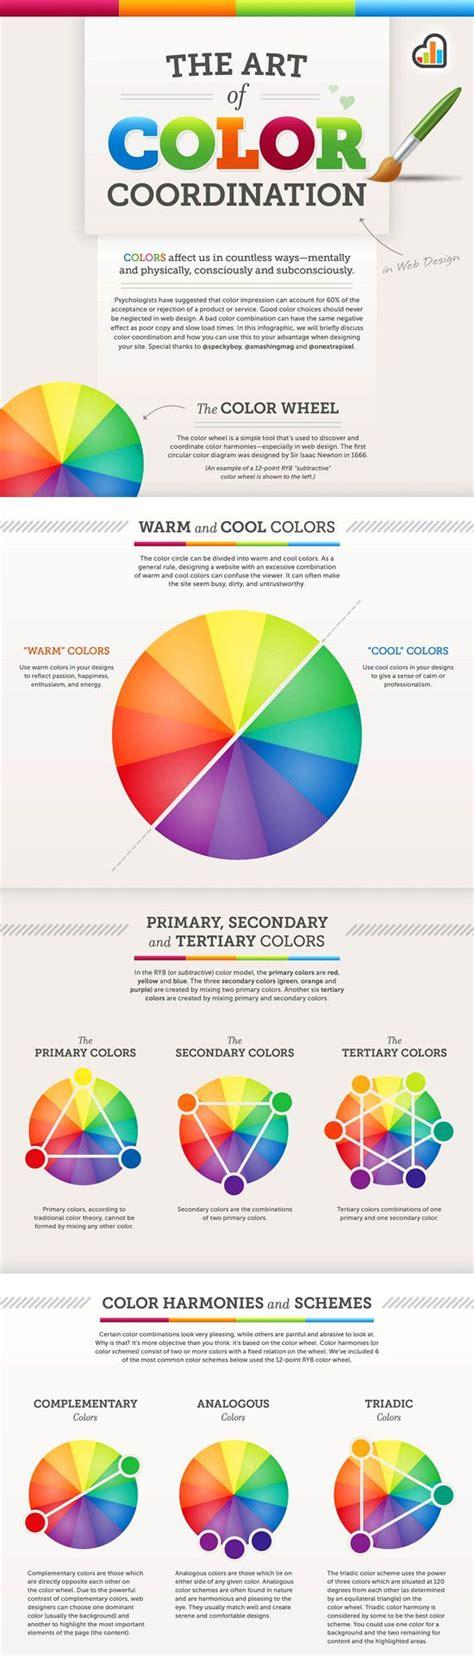 18 graphic design color mood images graphic design color 18 best images about color schemes on pinterest trips